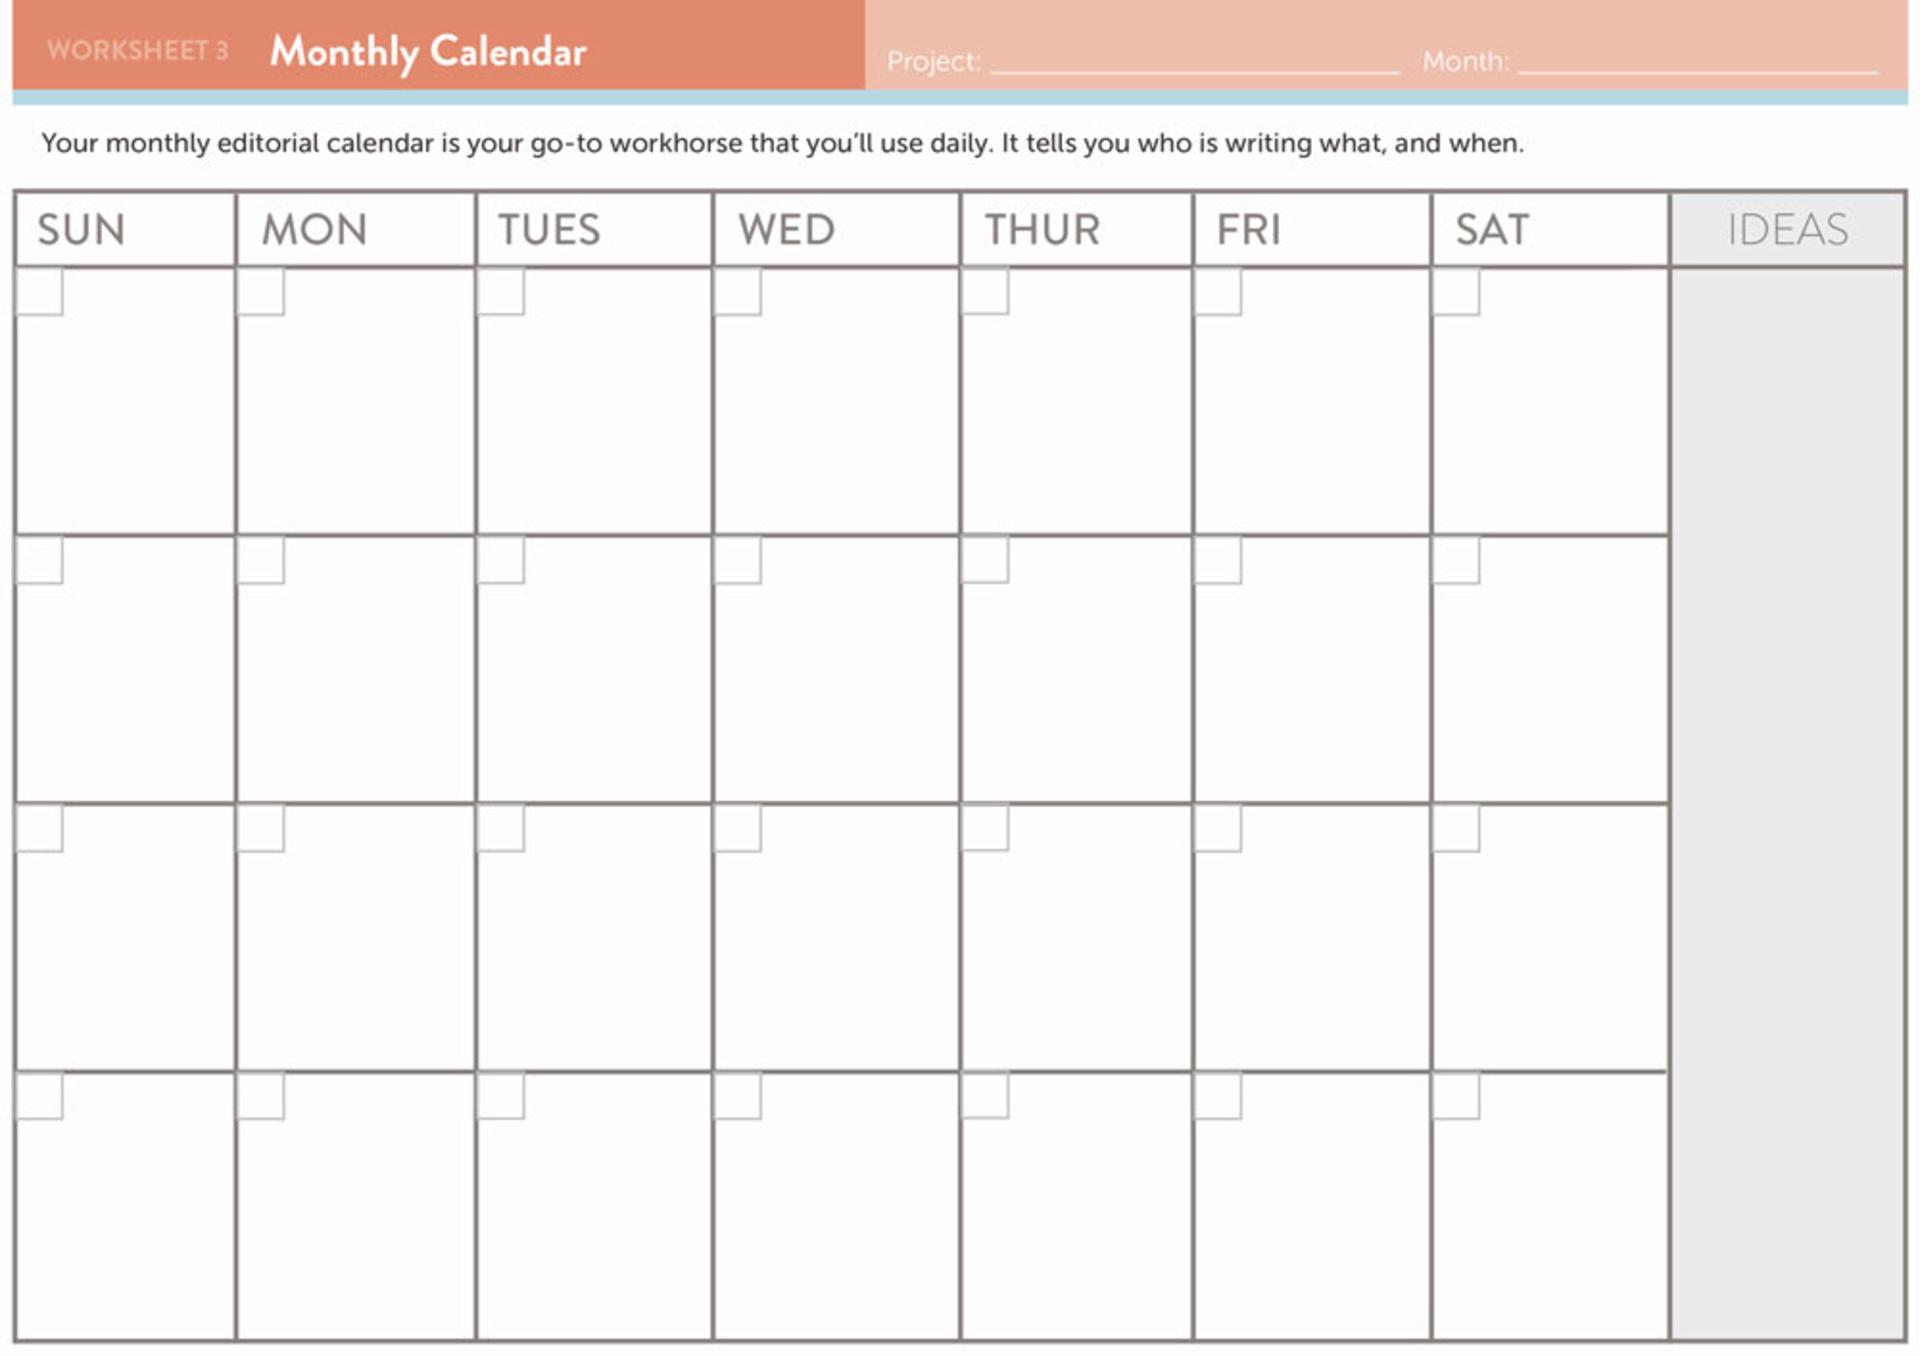 Winkl Blog - 3month-editorial-calendar-1-1